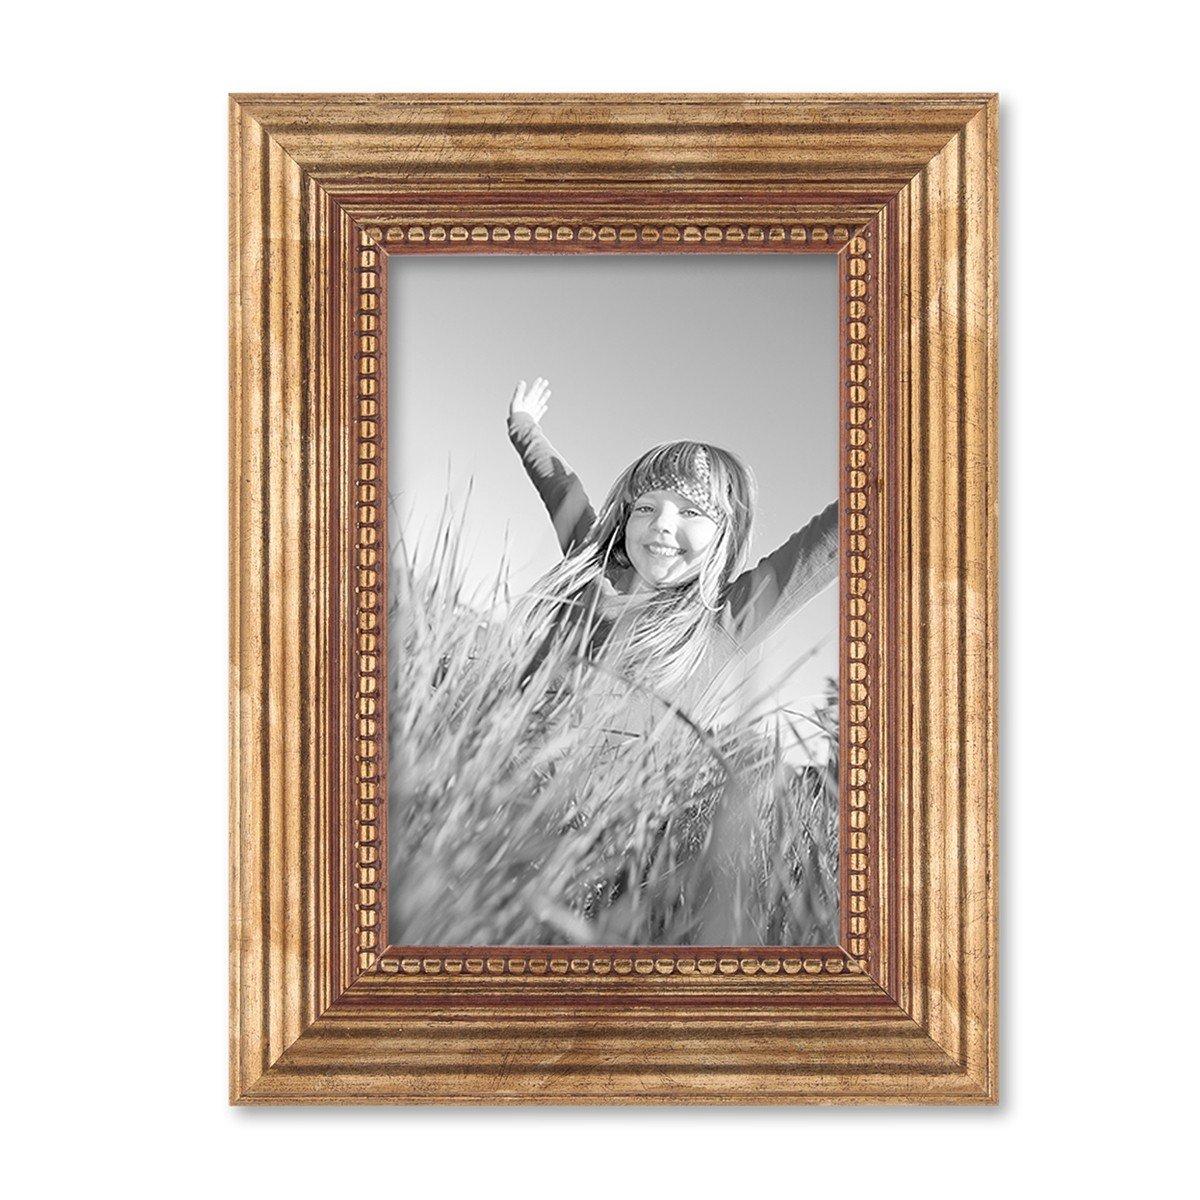 Amazon.de: PHOTOLINI 12er-Set Bilderrahmen Gold Barock Antik 10x15 ...